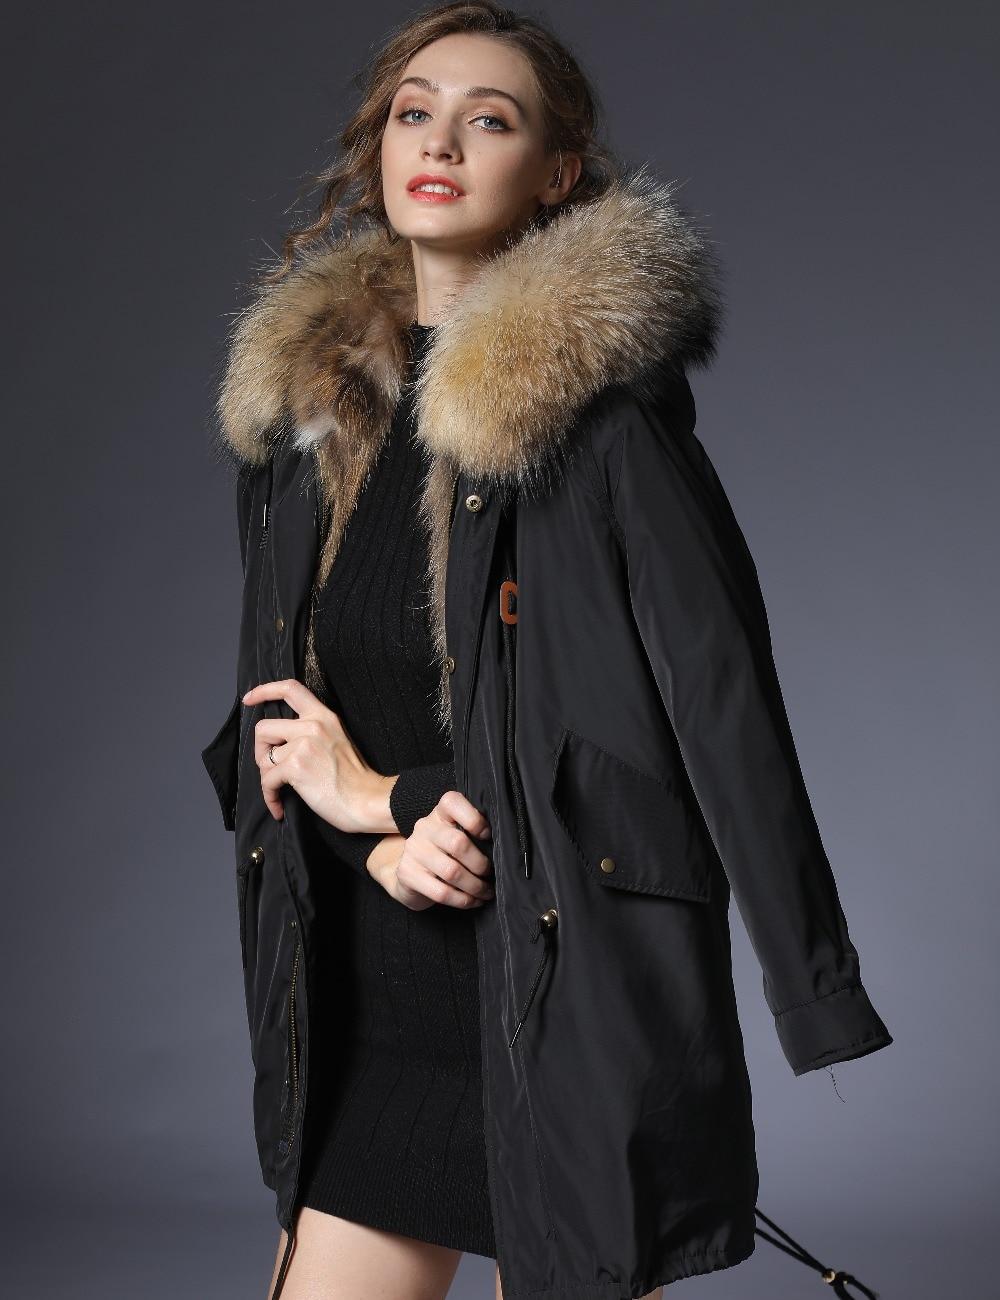 2018 parka woman winter jacket parkas women long real fur coat big raccoon fur collar hooded parkas thick outerwear stree style